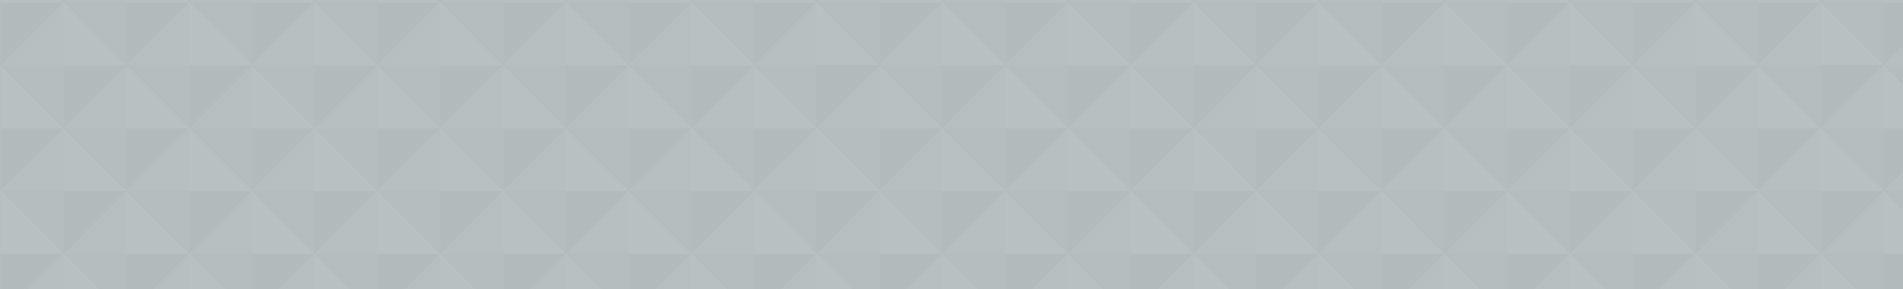 7614_WEB_Covisum_landing-page-graphics-DIAMOND_II.jpg